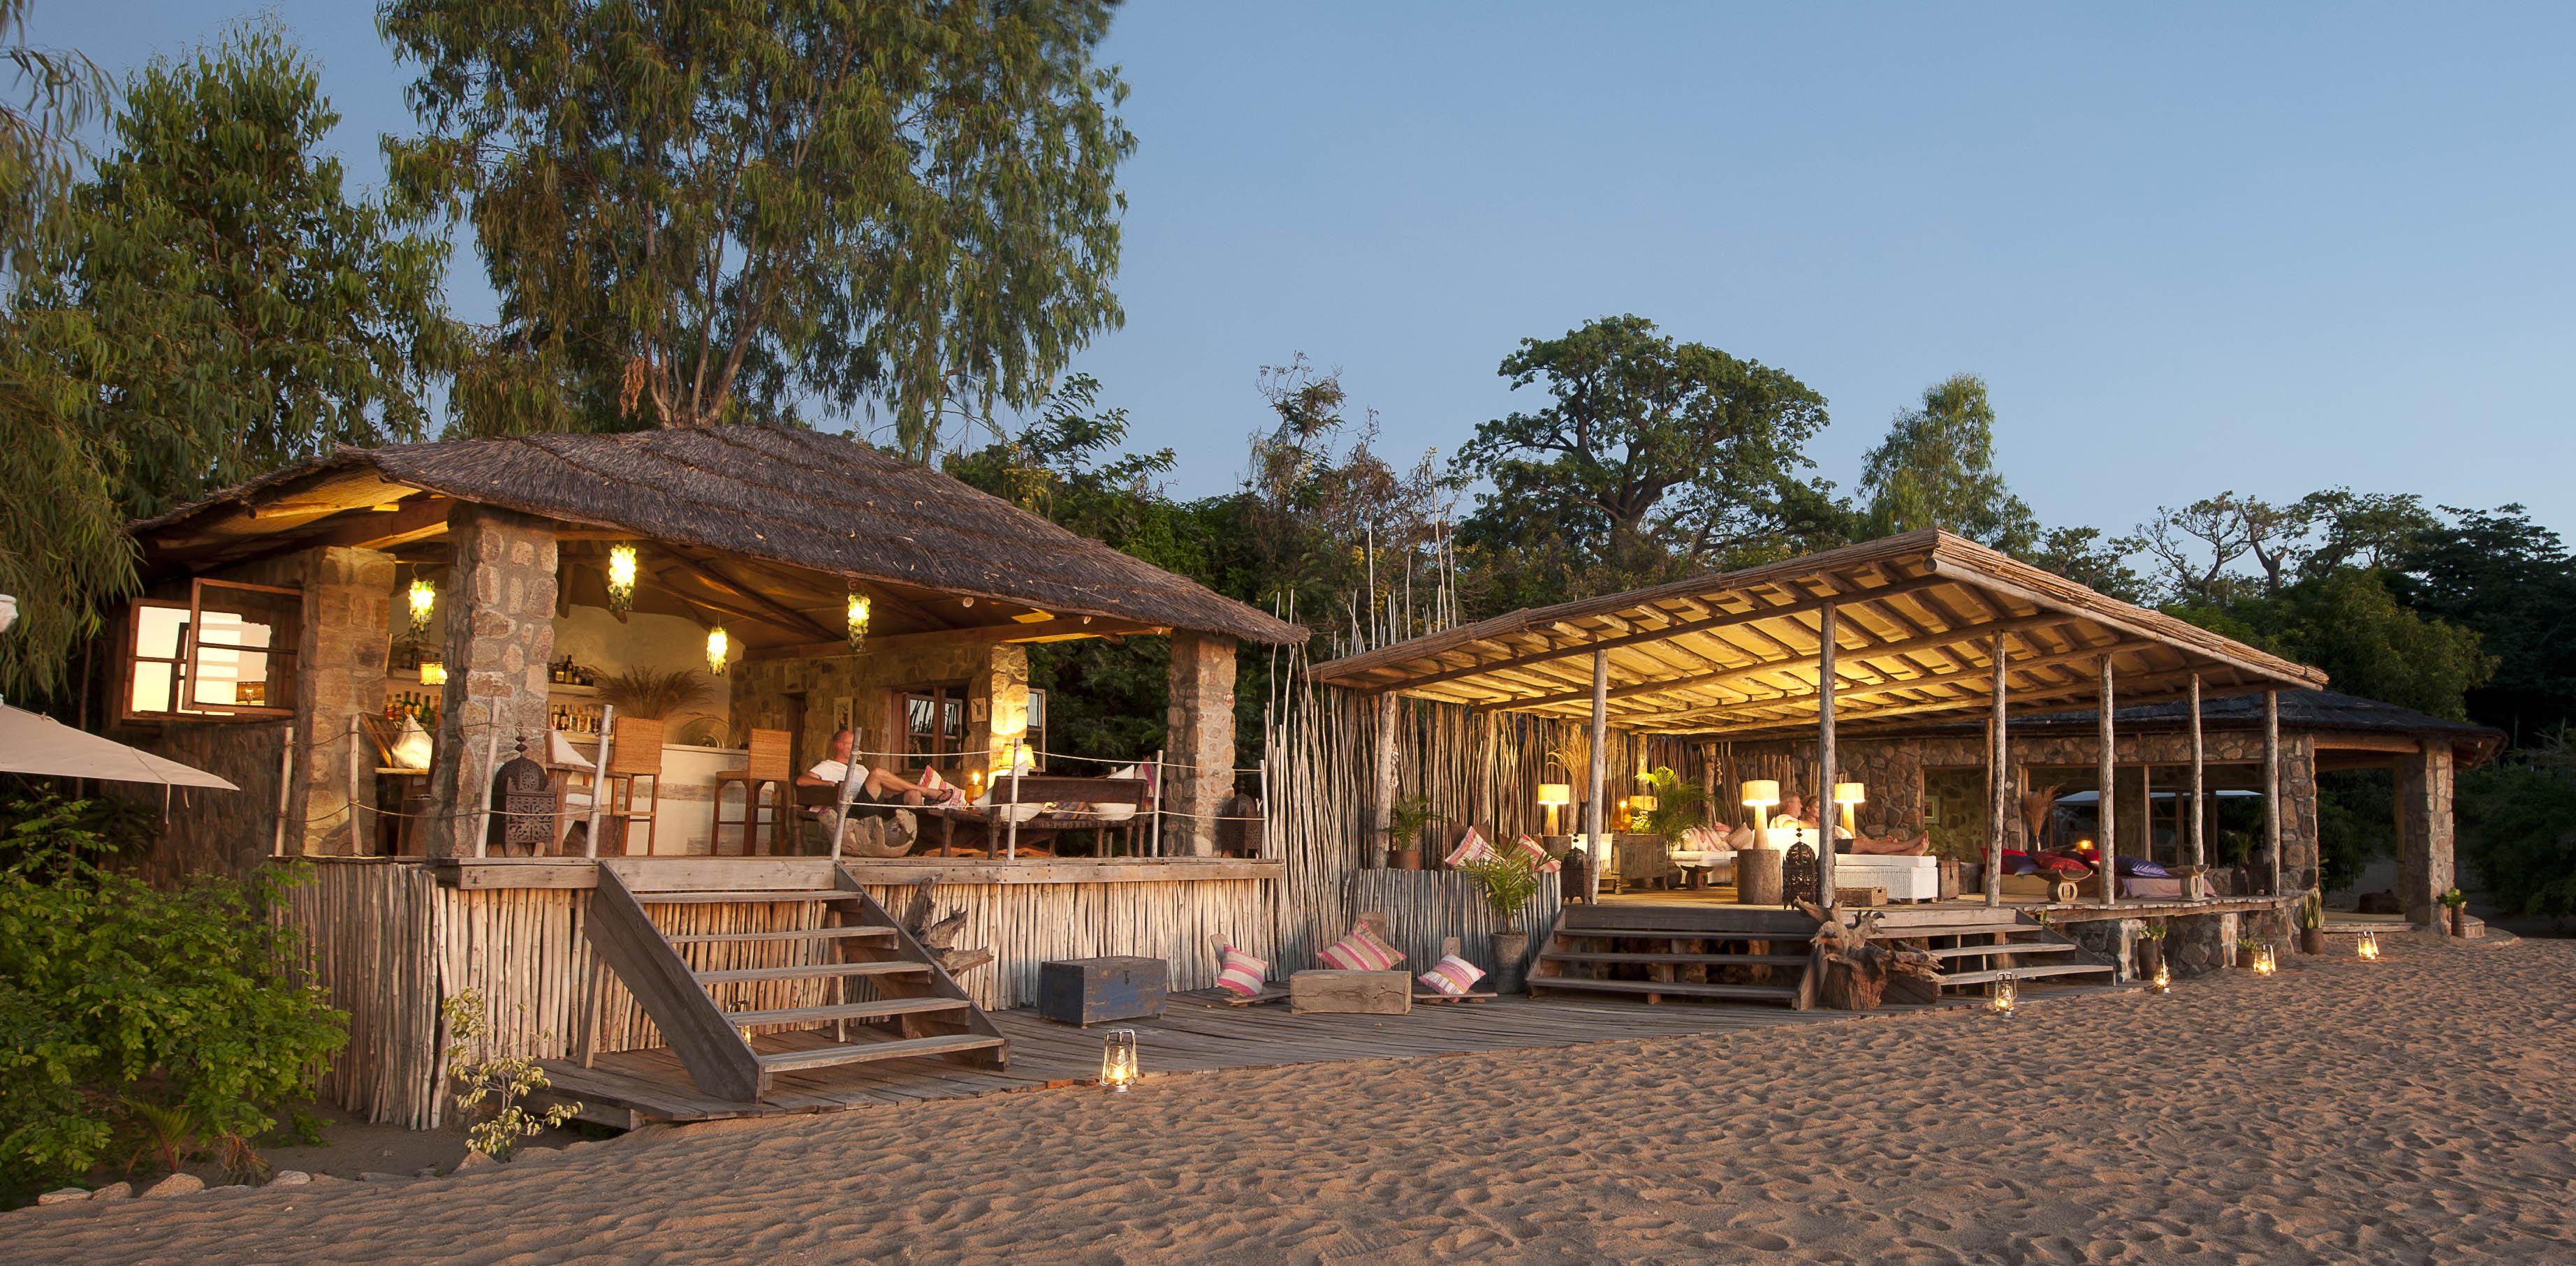 Kaya Mawa Lodge Malawi Exterior